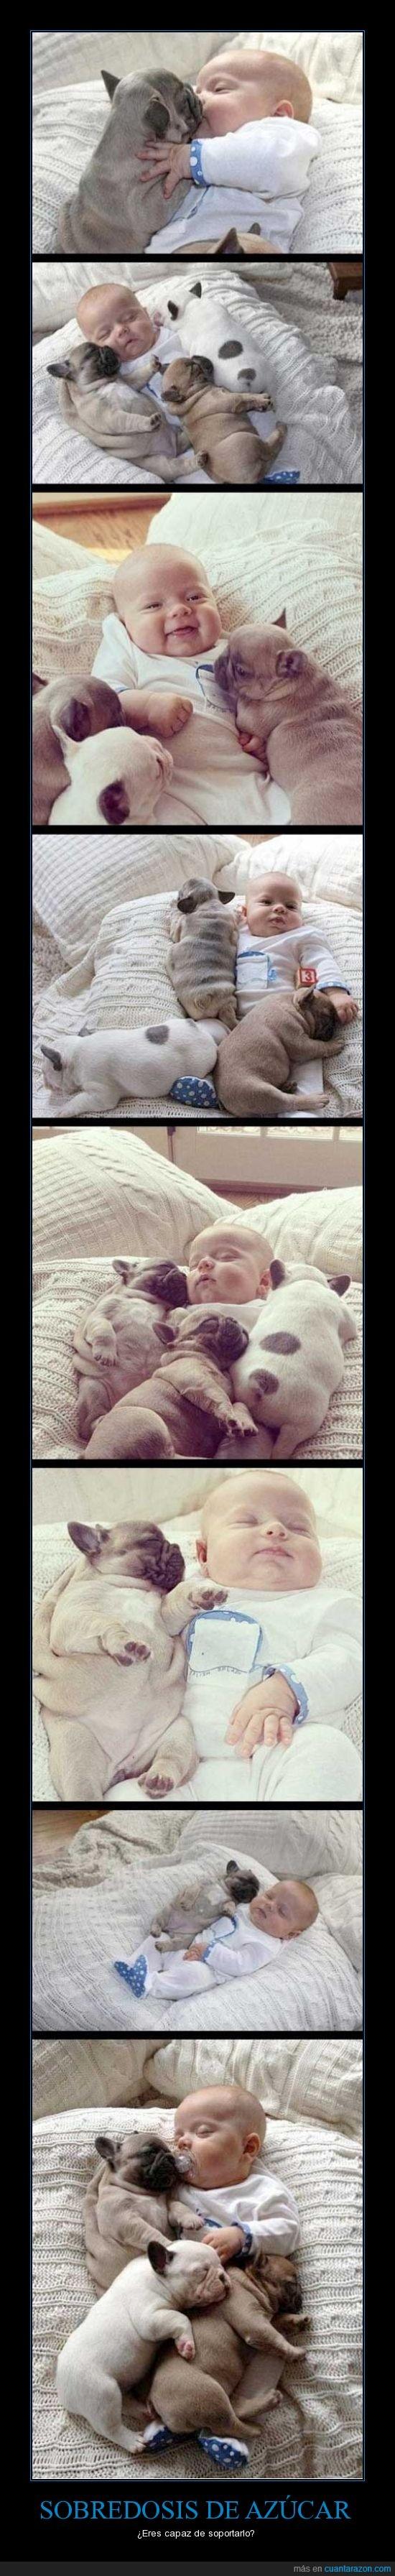 adorable,bebé,cachorro,cama,niño,perritos,ternura